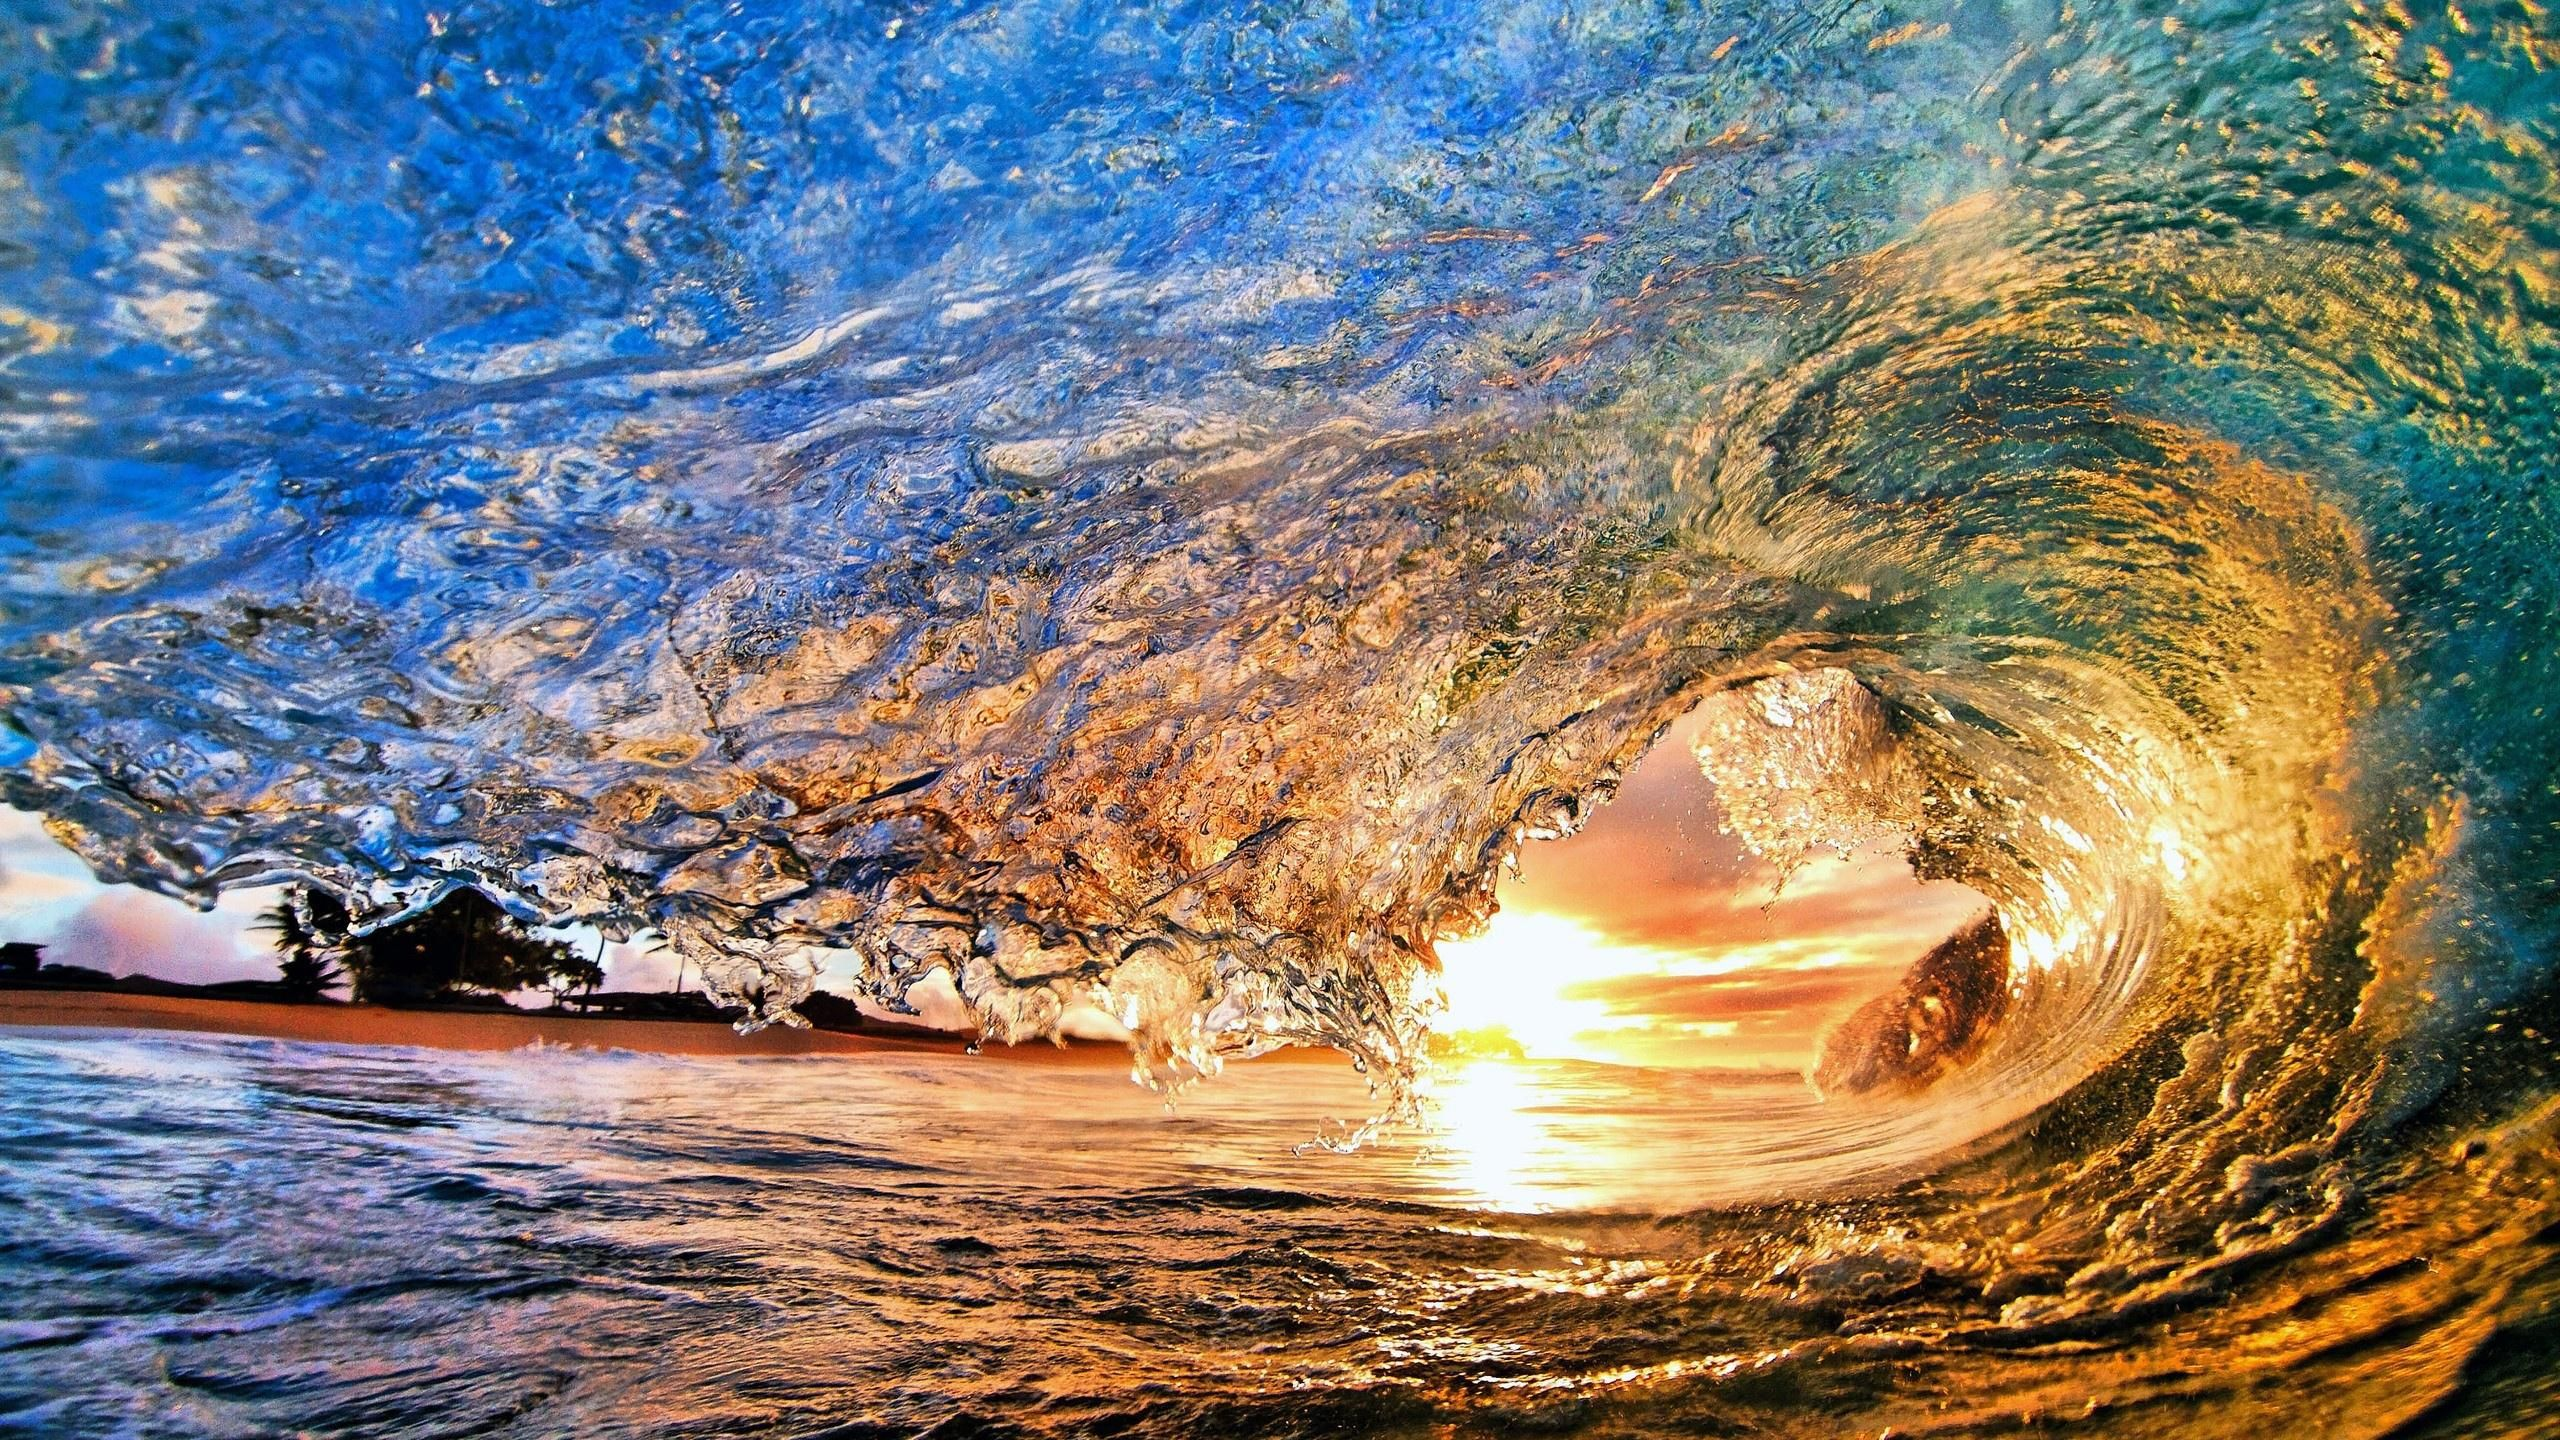 Hd wallpaper travel - Hawaii Wave Wallpaper Wallpaper Hd